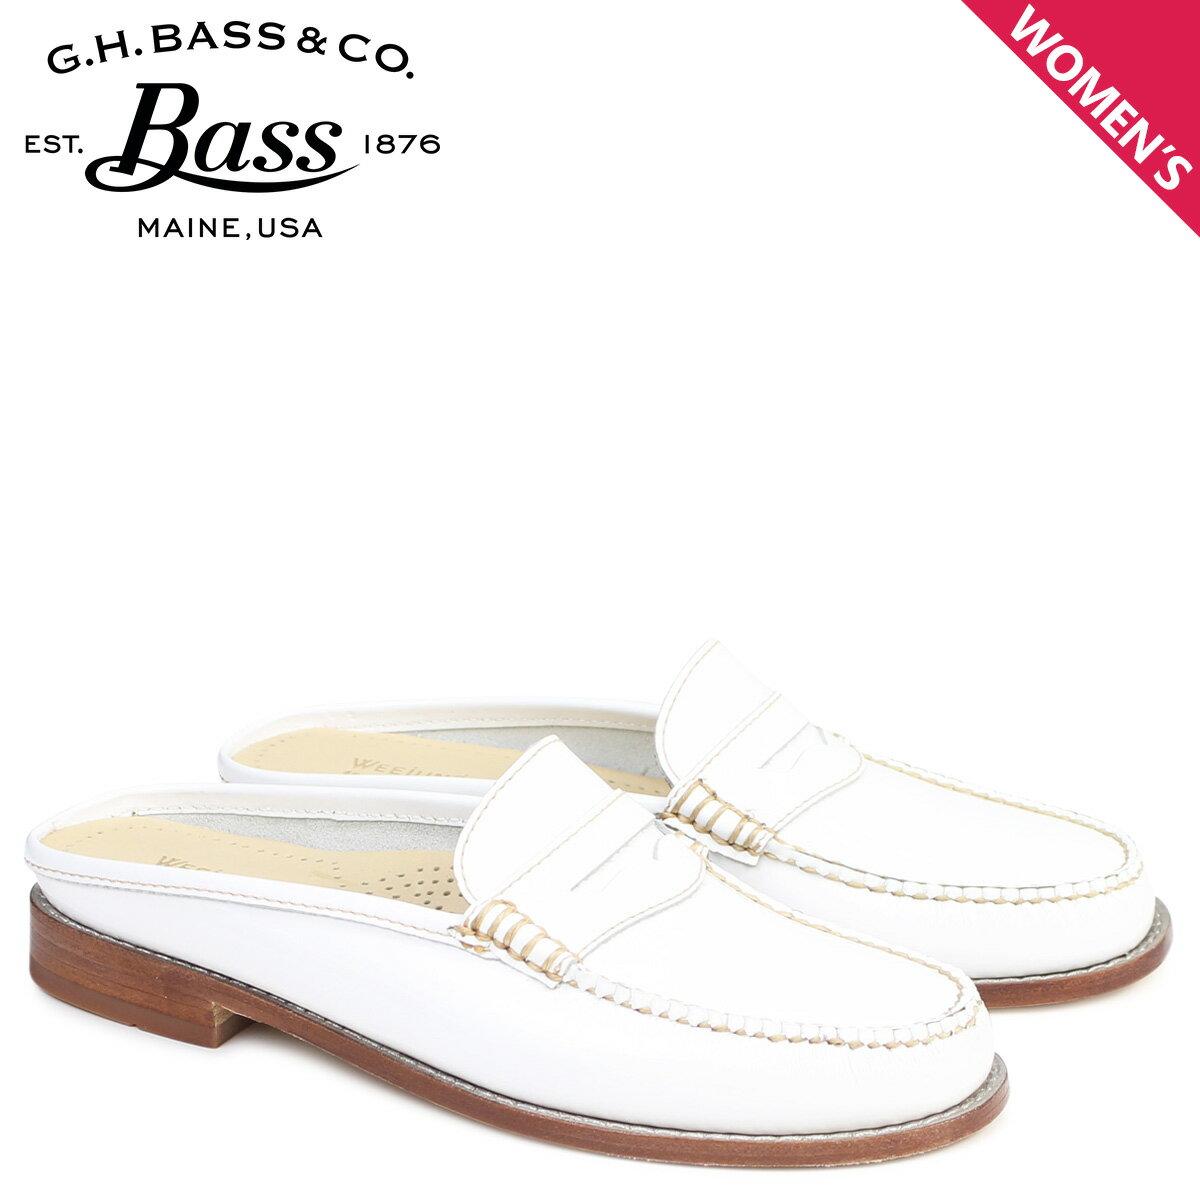 G.H. BASS ローファー ジーエイチバス レディース サンダル スリッパ バブーシュ WYNN PATENT LEATHER MULE WEEJUNS 71-22850 靴 ホワイト